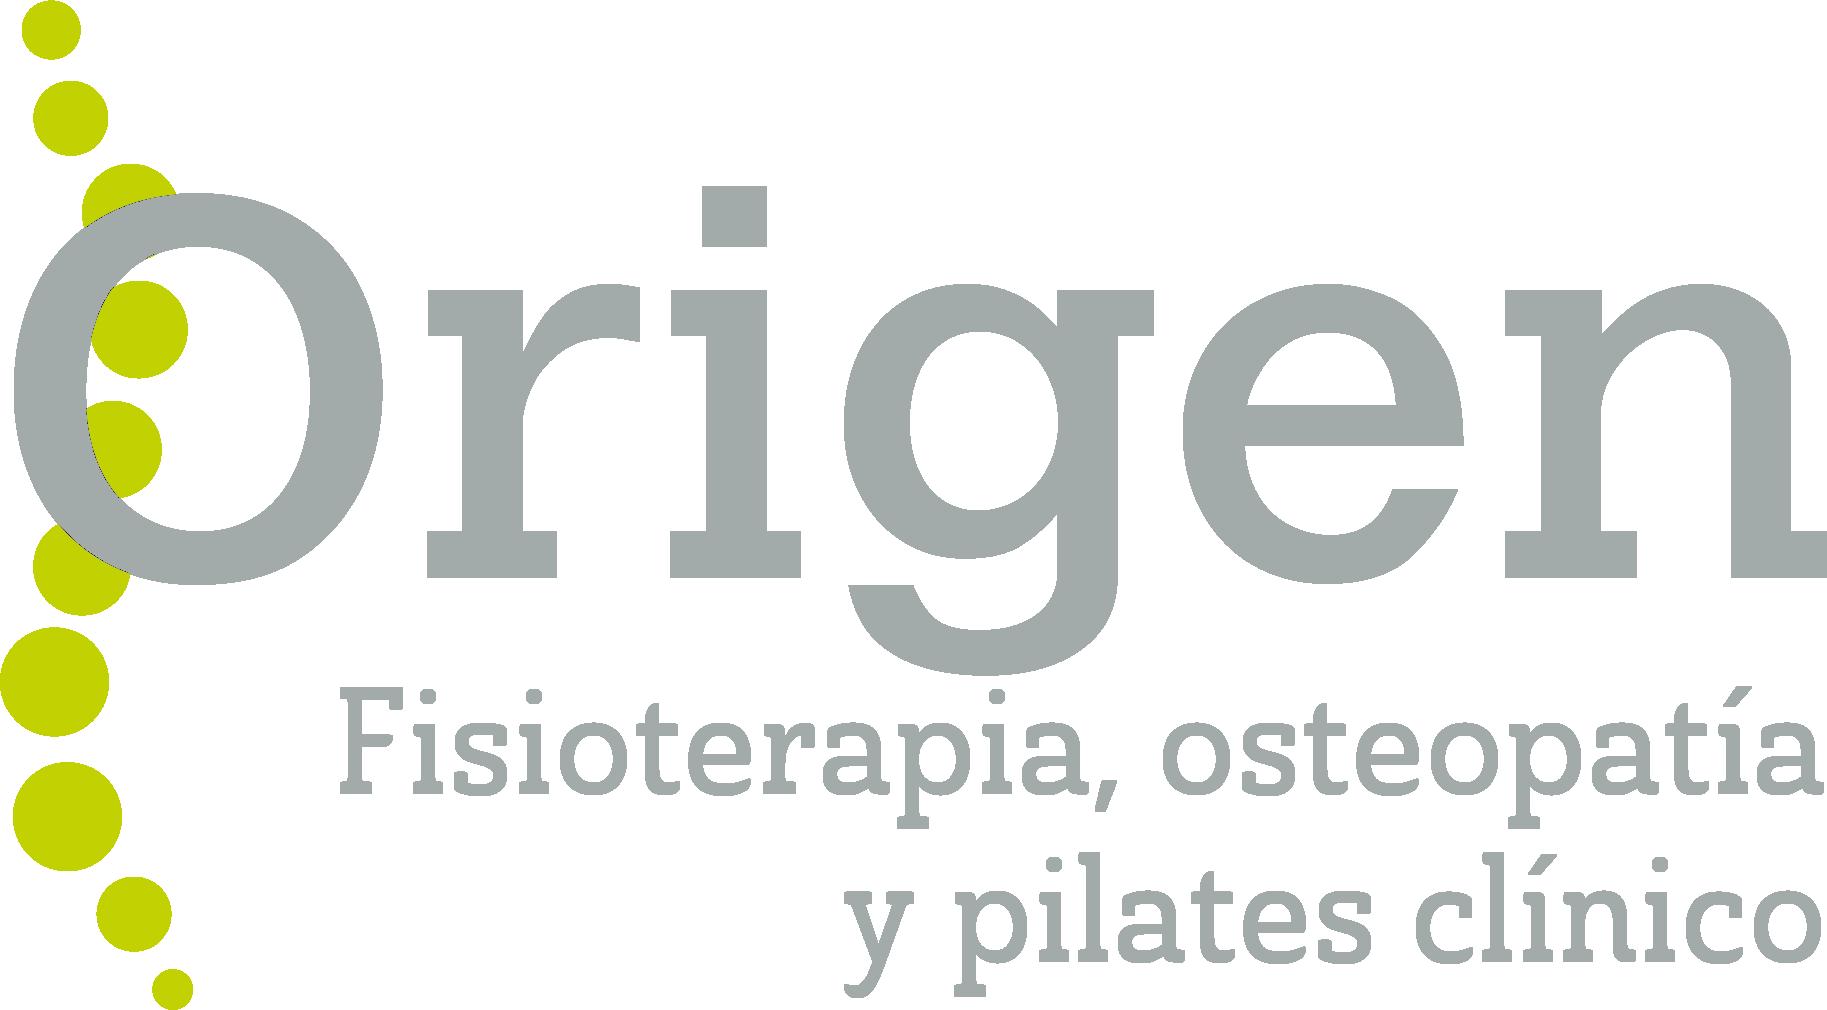 FisioterapiaOrigen